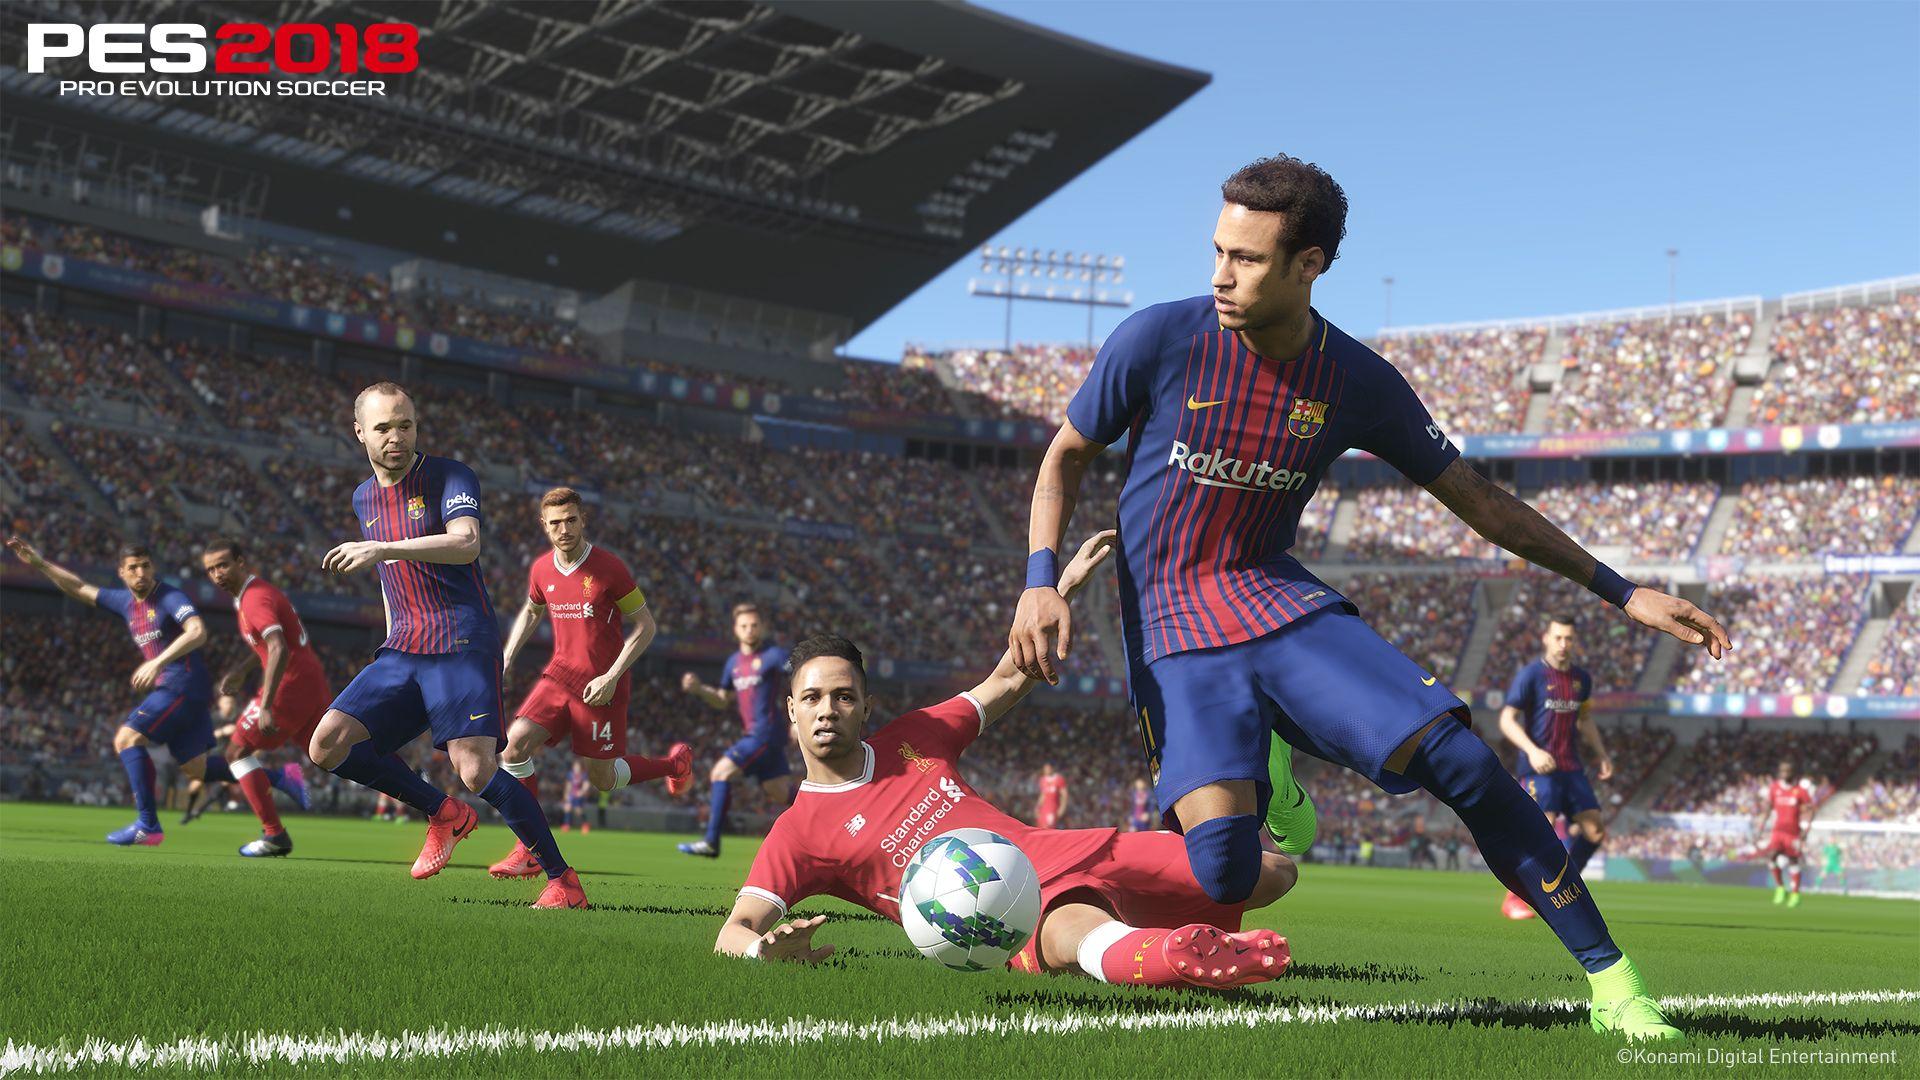 Pro evolution soccer 2013 for mac os x torrent